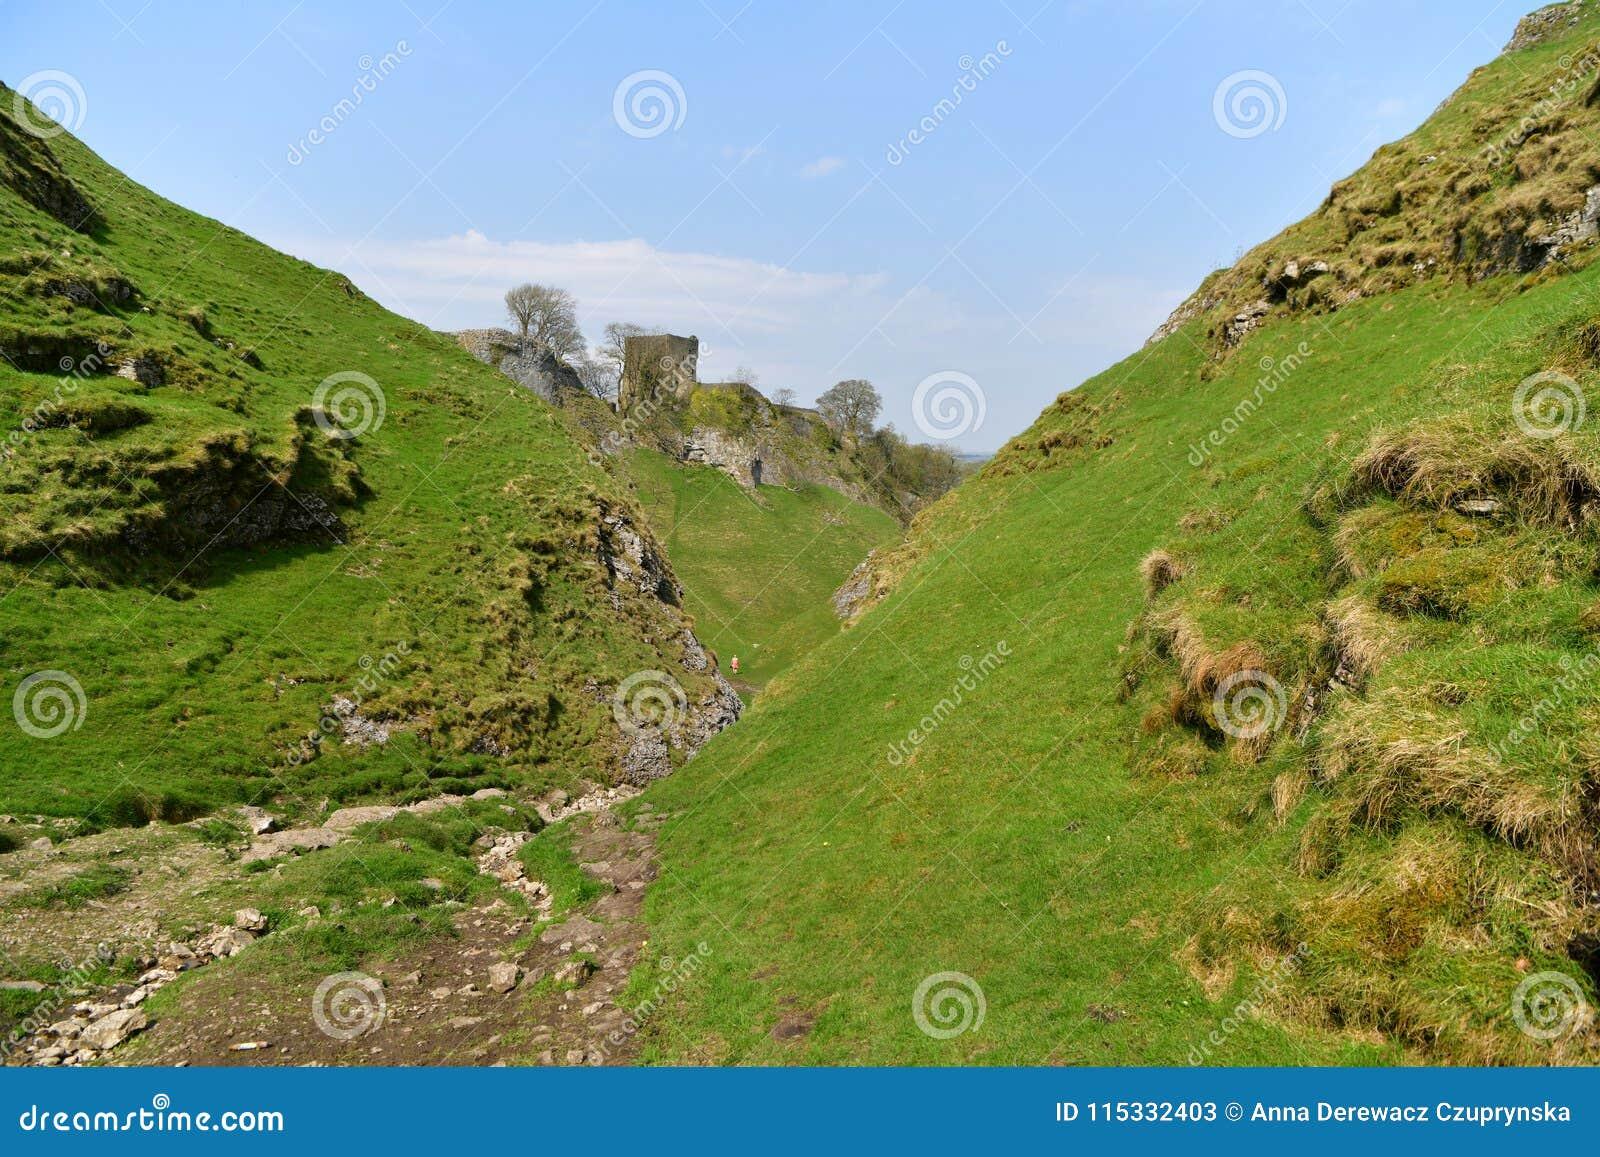 Distrito máximo Reino Unido, castillo histórico viejo de Peveril, subida